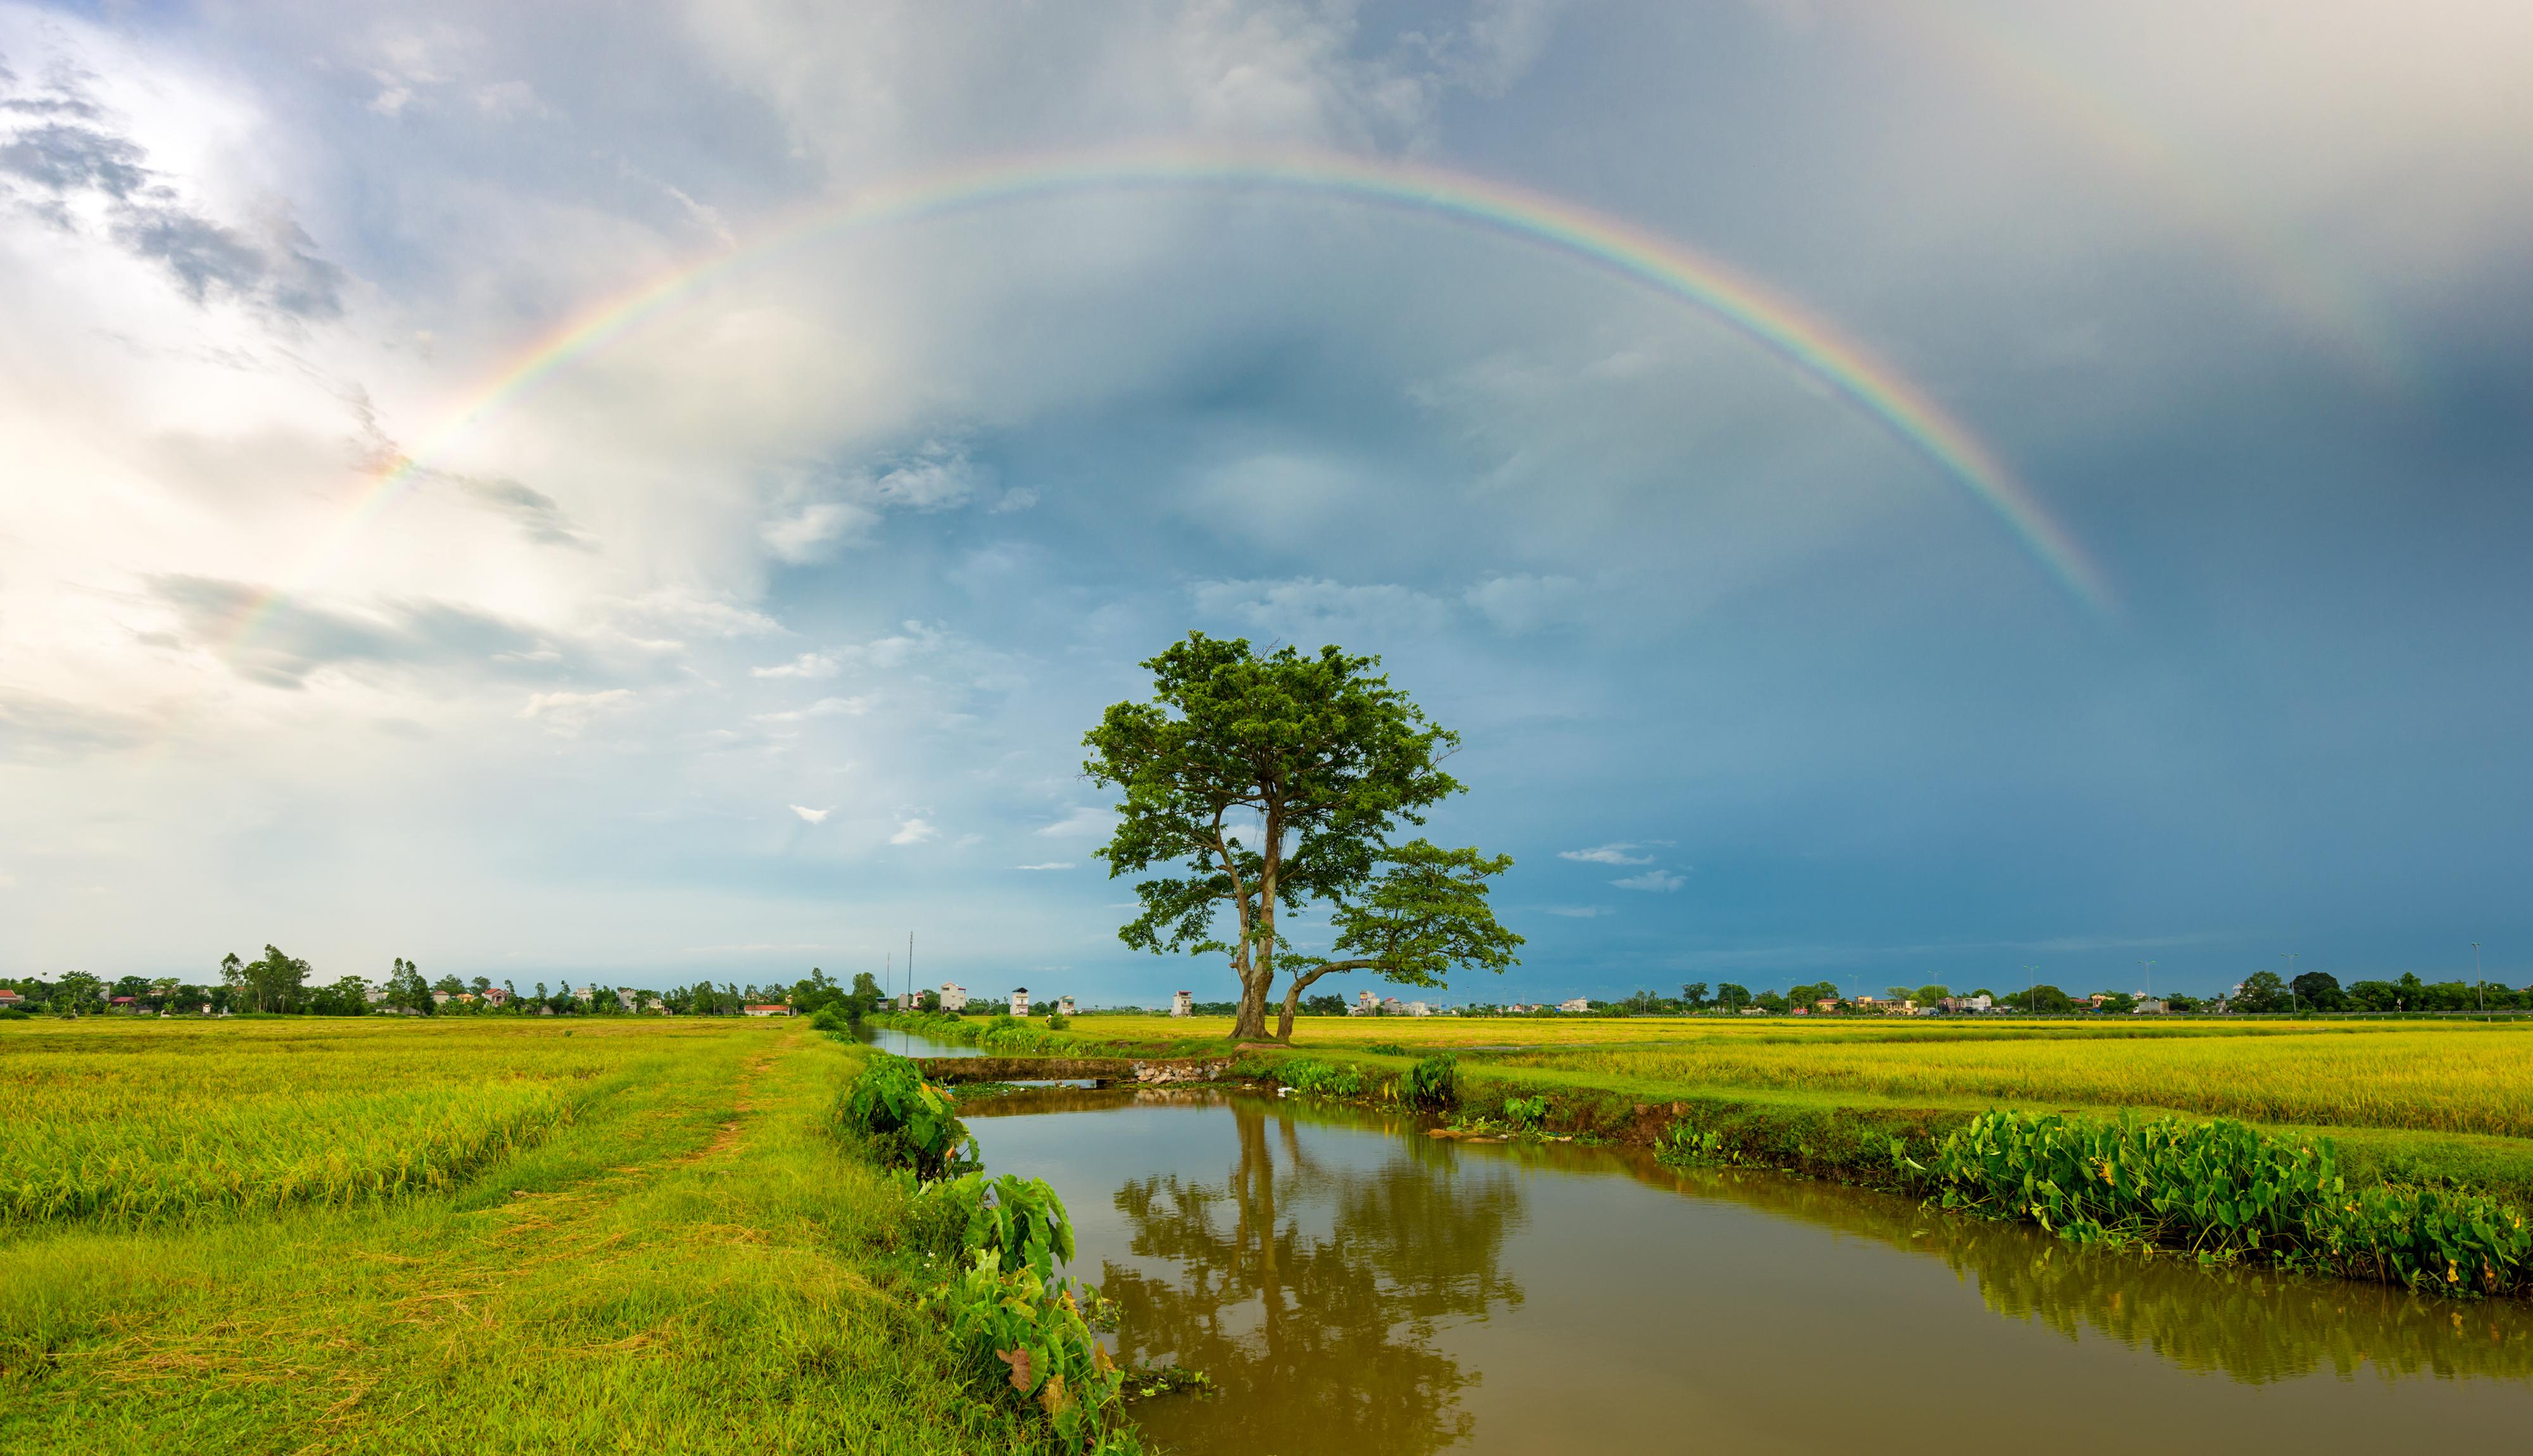 彩虹。(shutterstock)